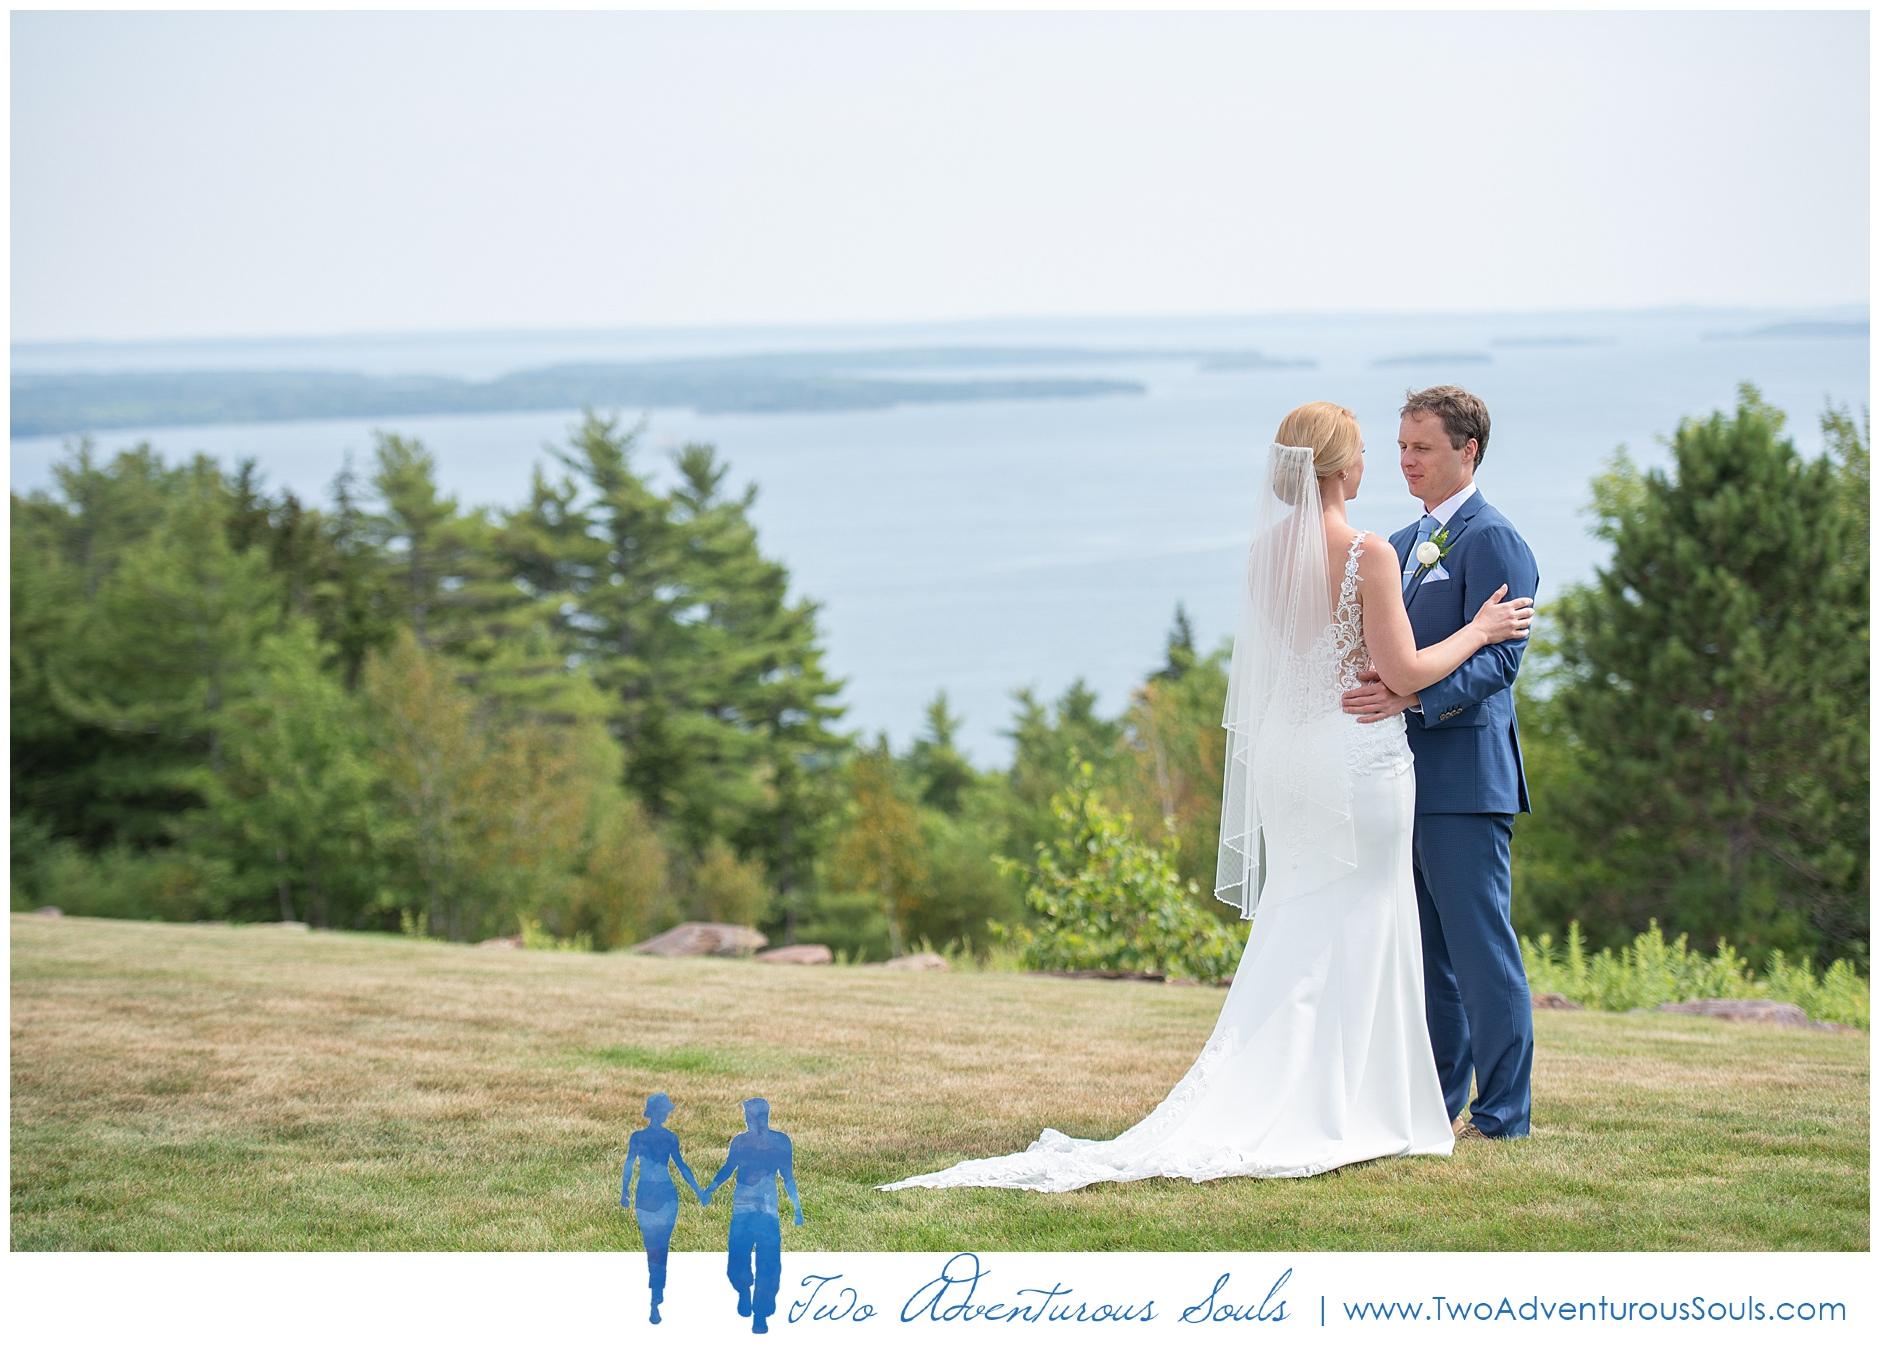 Maine Wedding Photographers, Point Lookout Wedding Photographers, Maine Elopement Photographers, Two Adventurous Souls-0080419_0023.jpg